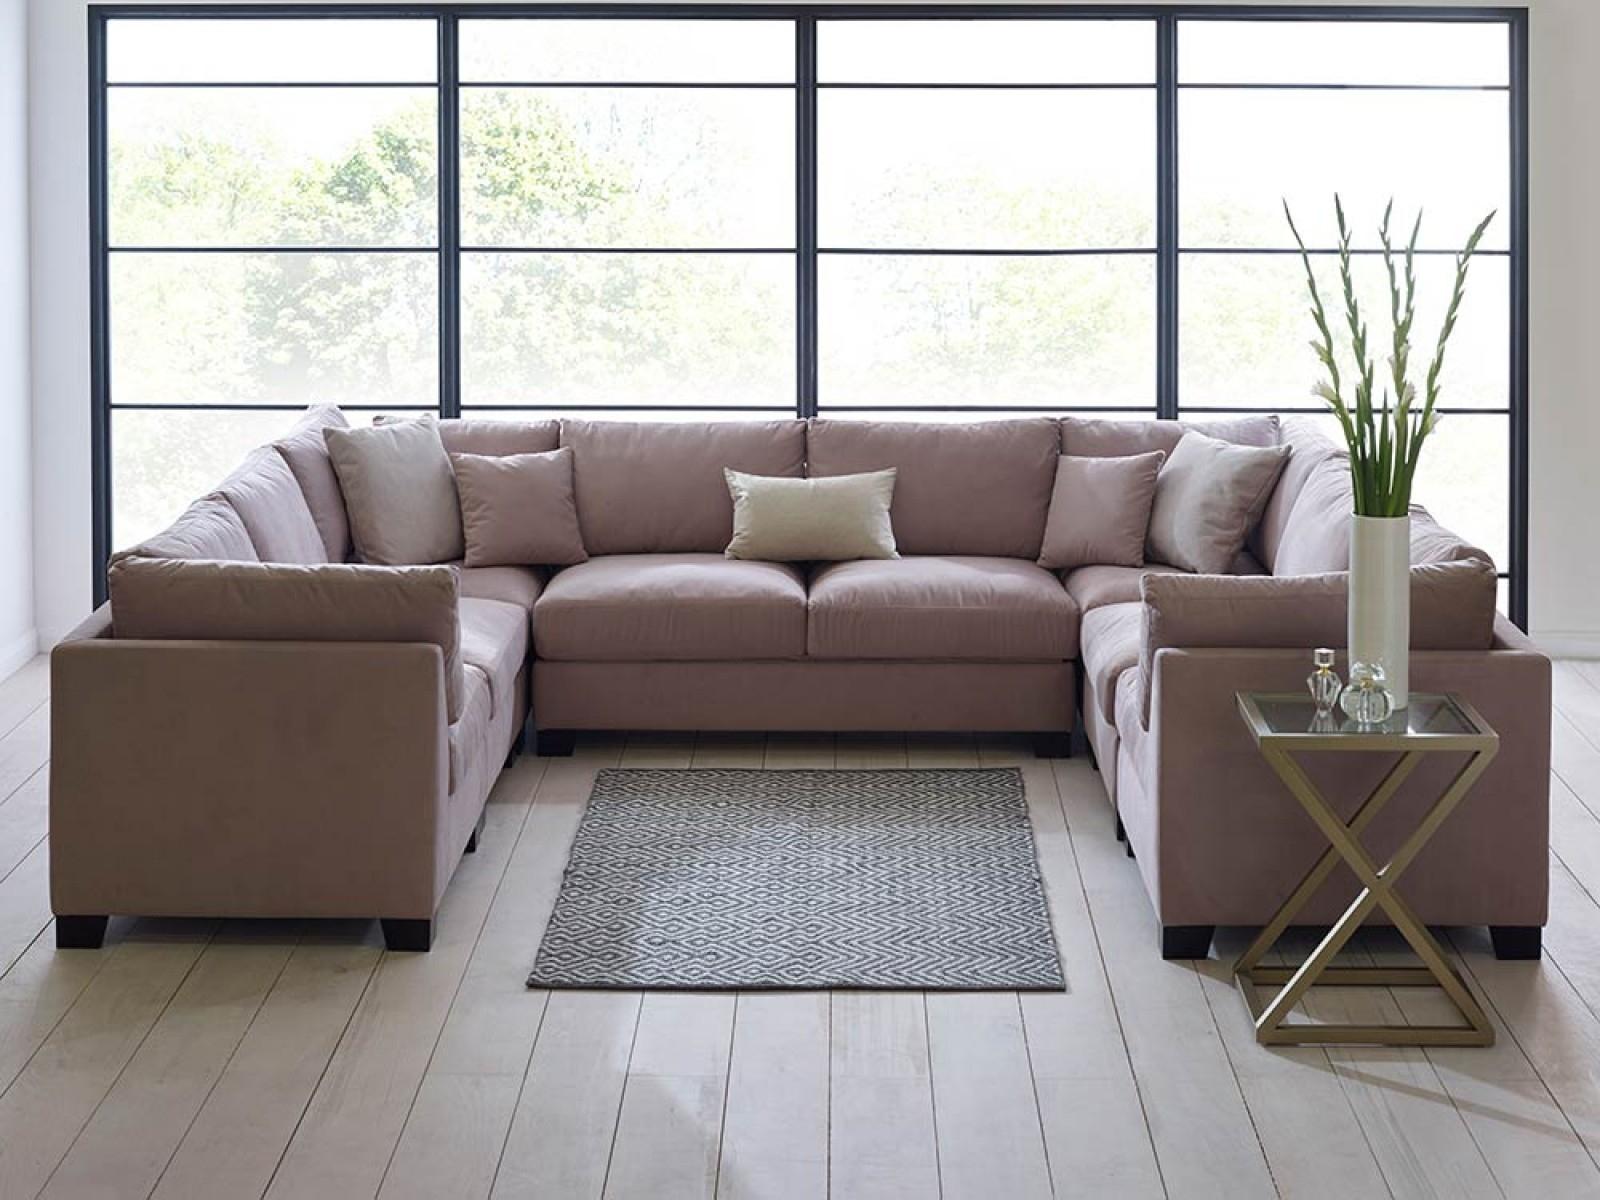 2018 U Shaped Sofa – Google Search (View 3 of 20)